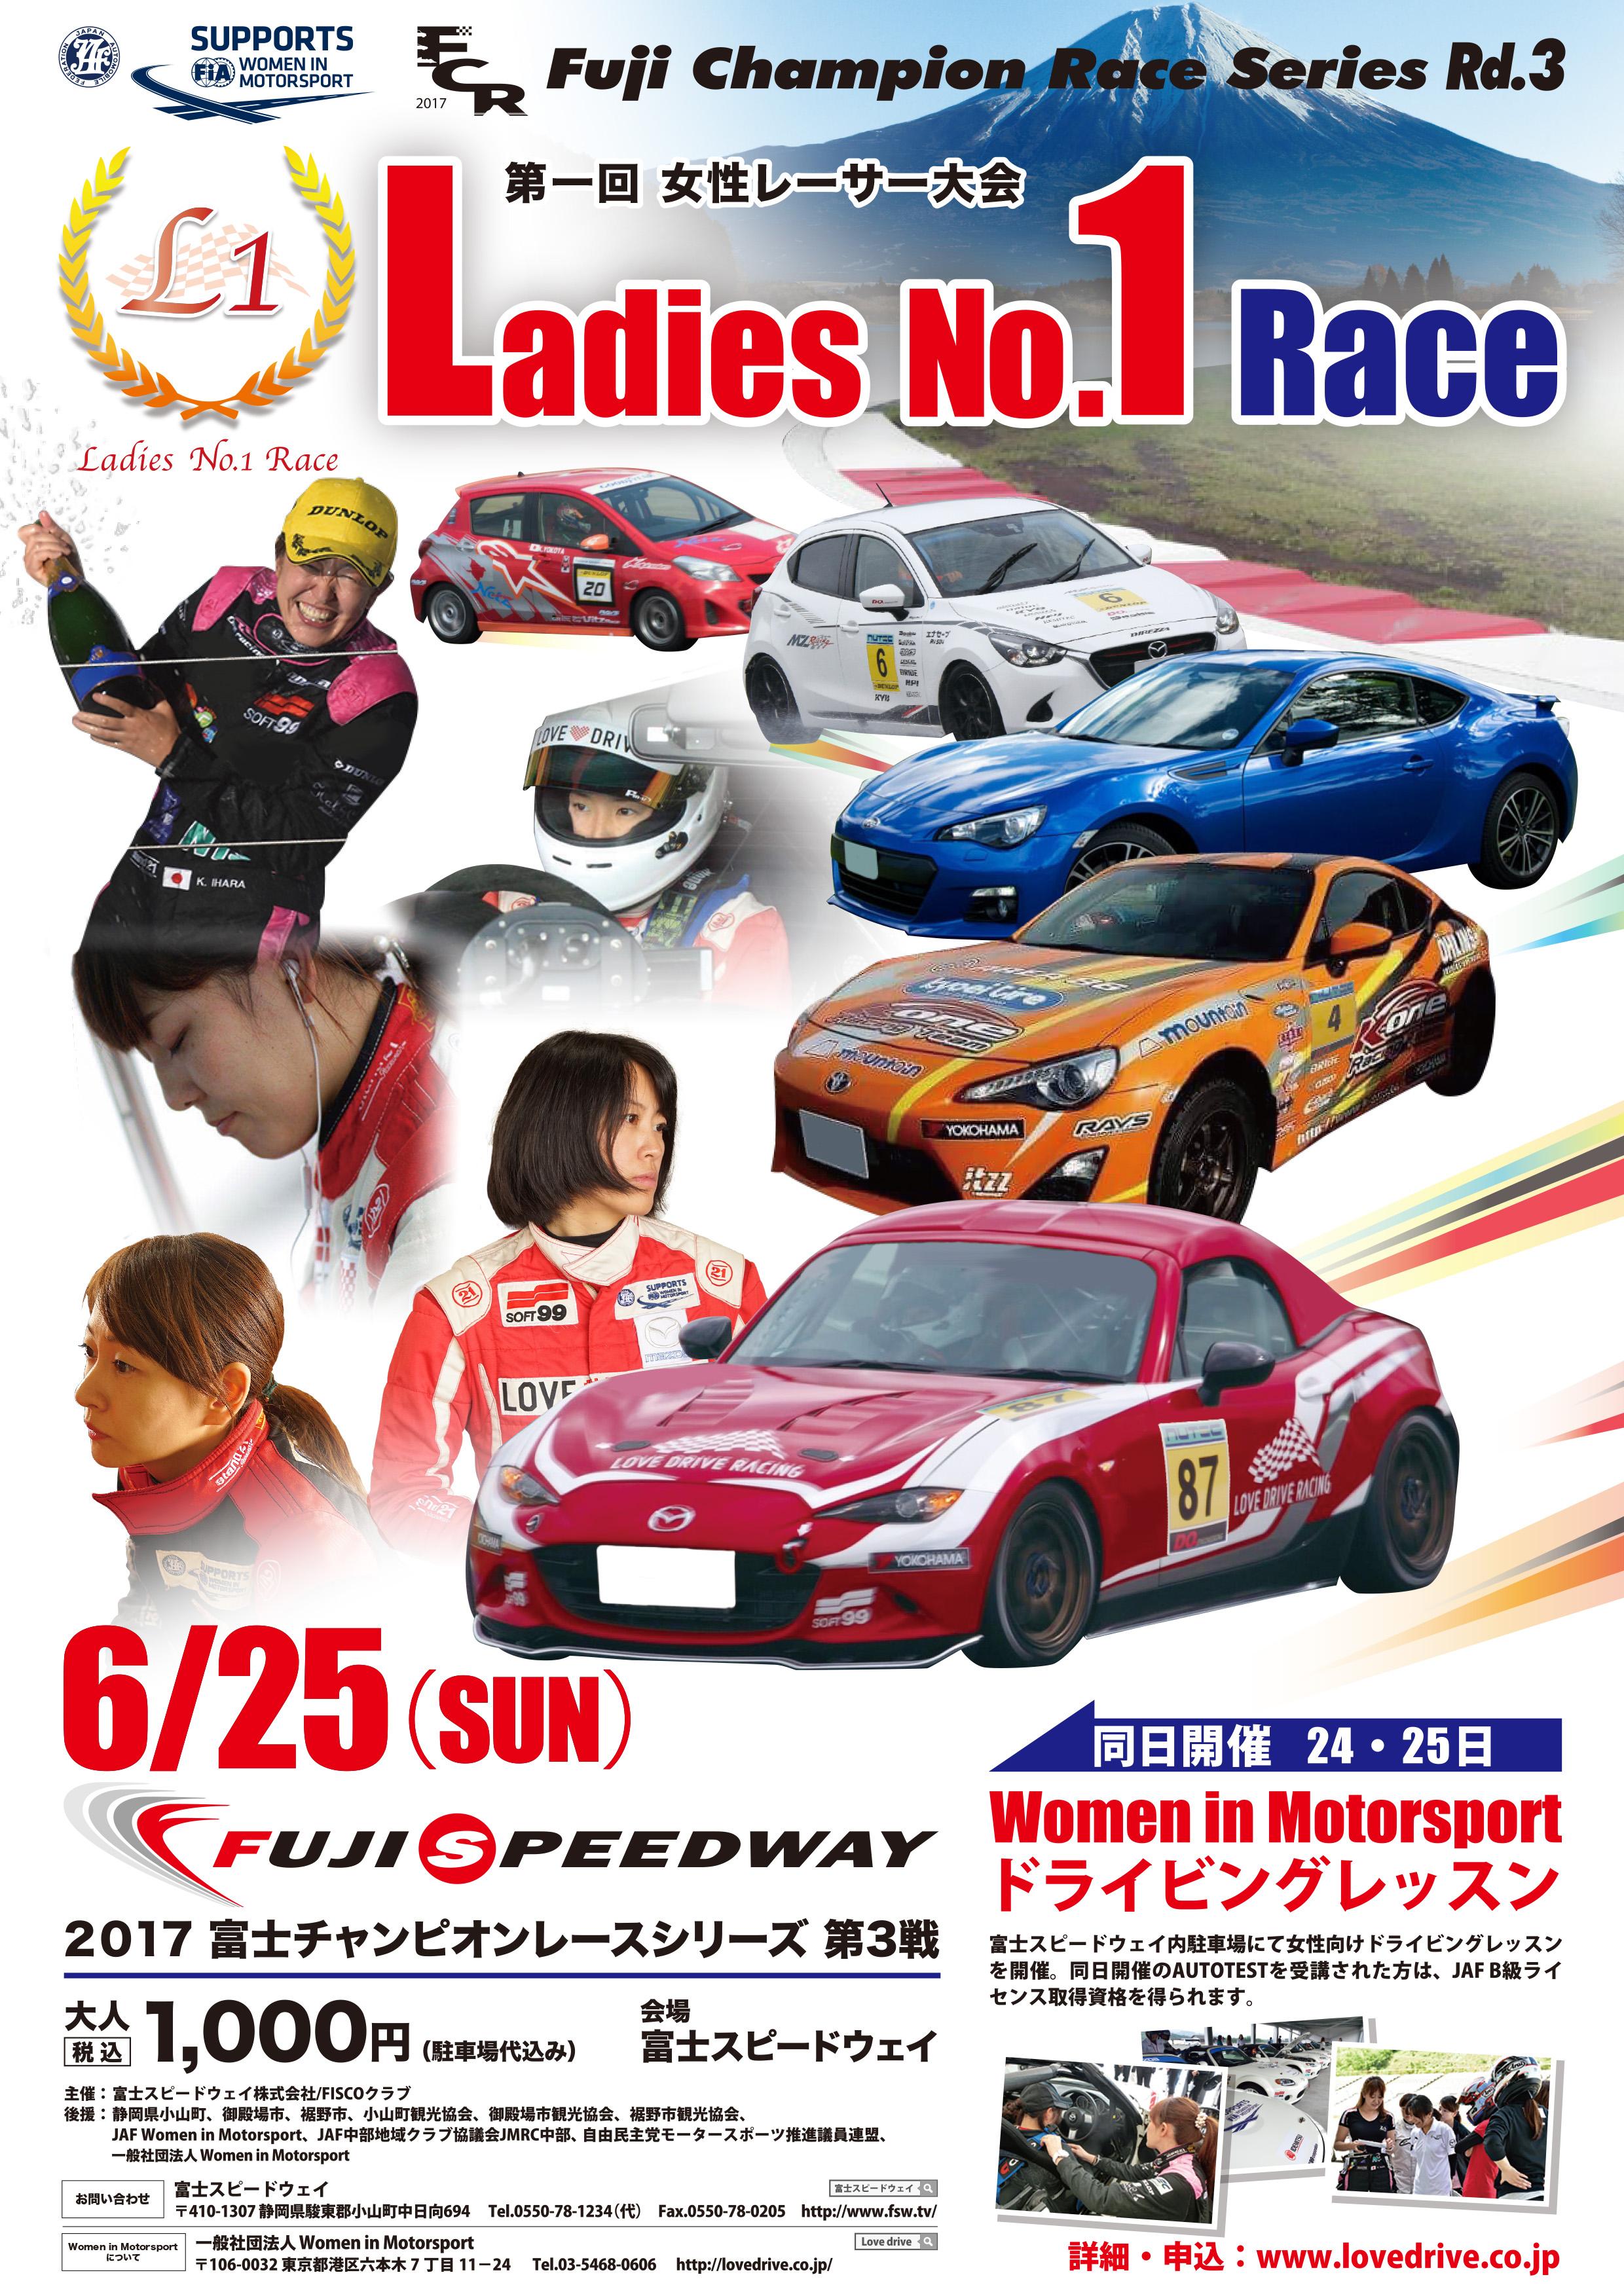 Women in Motorsportドライビングレッスン